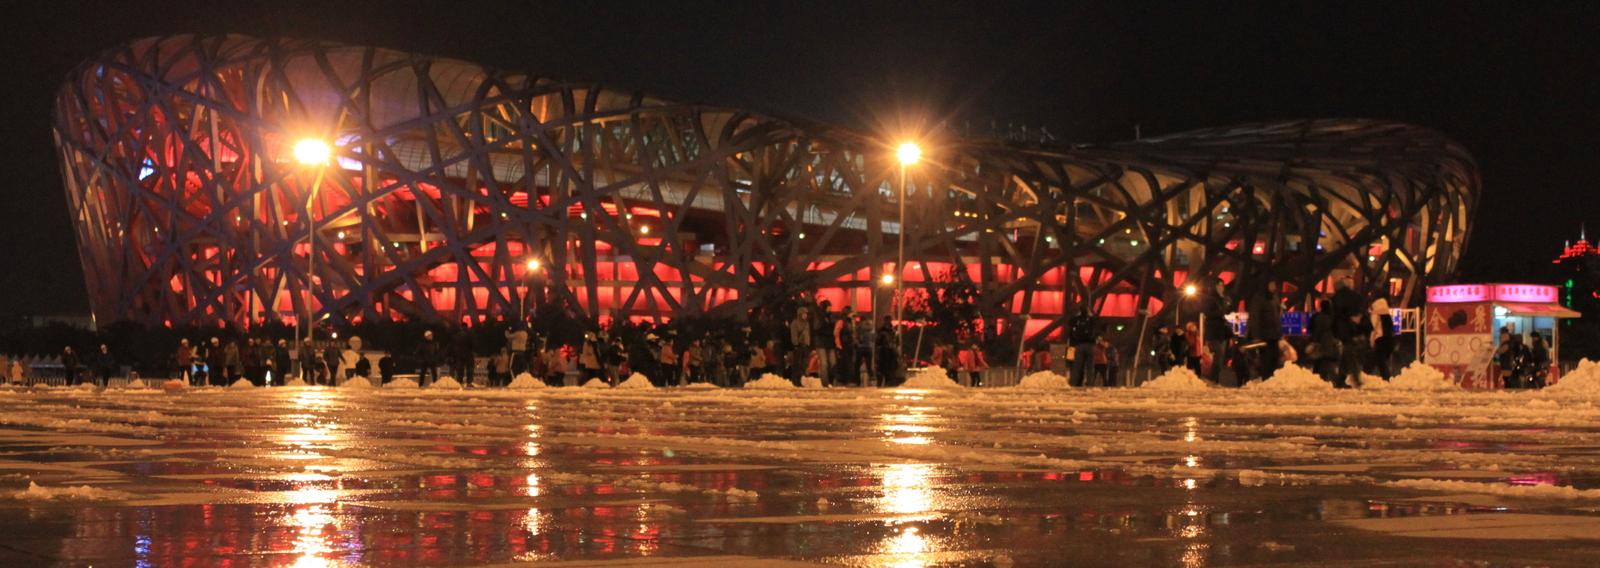 Olympic Park, Beijing